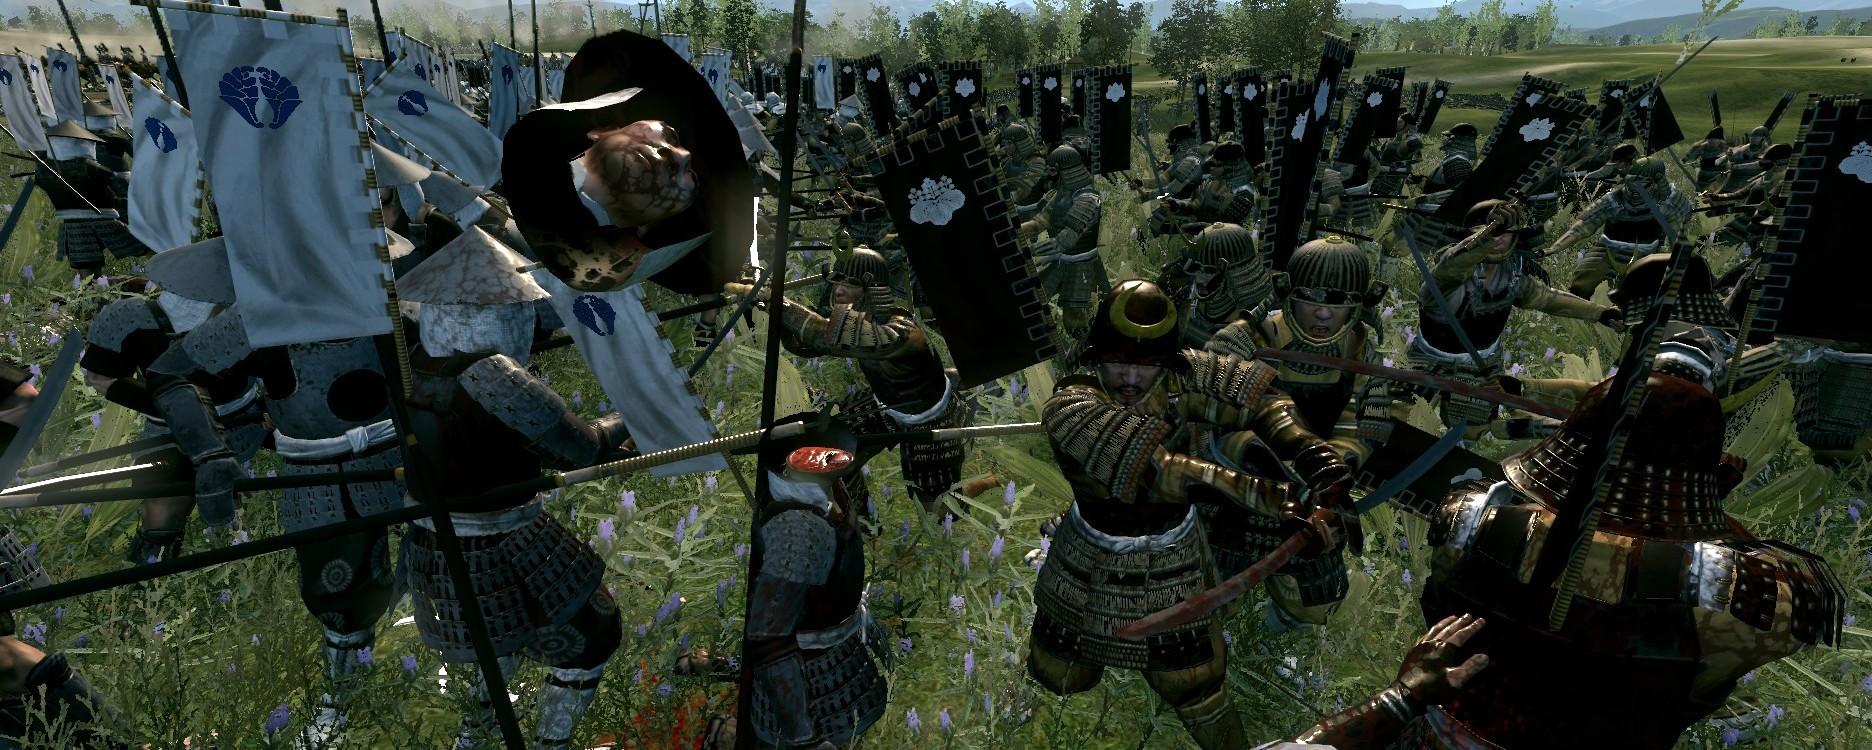 Shogun 2 Fall Of The Samurai Wallpaper Darthmod Shogun Promotional Pictures Image Mod Db